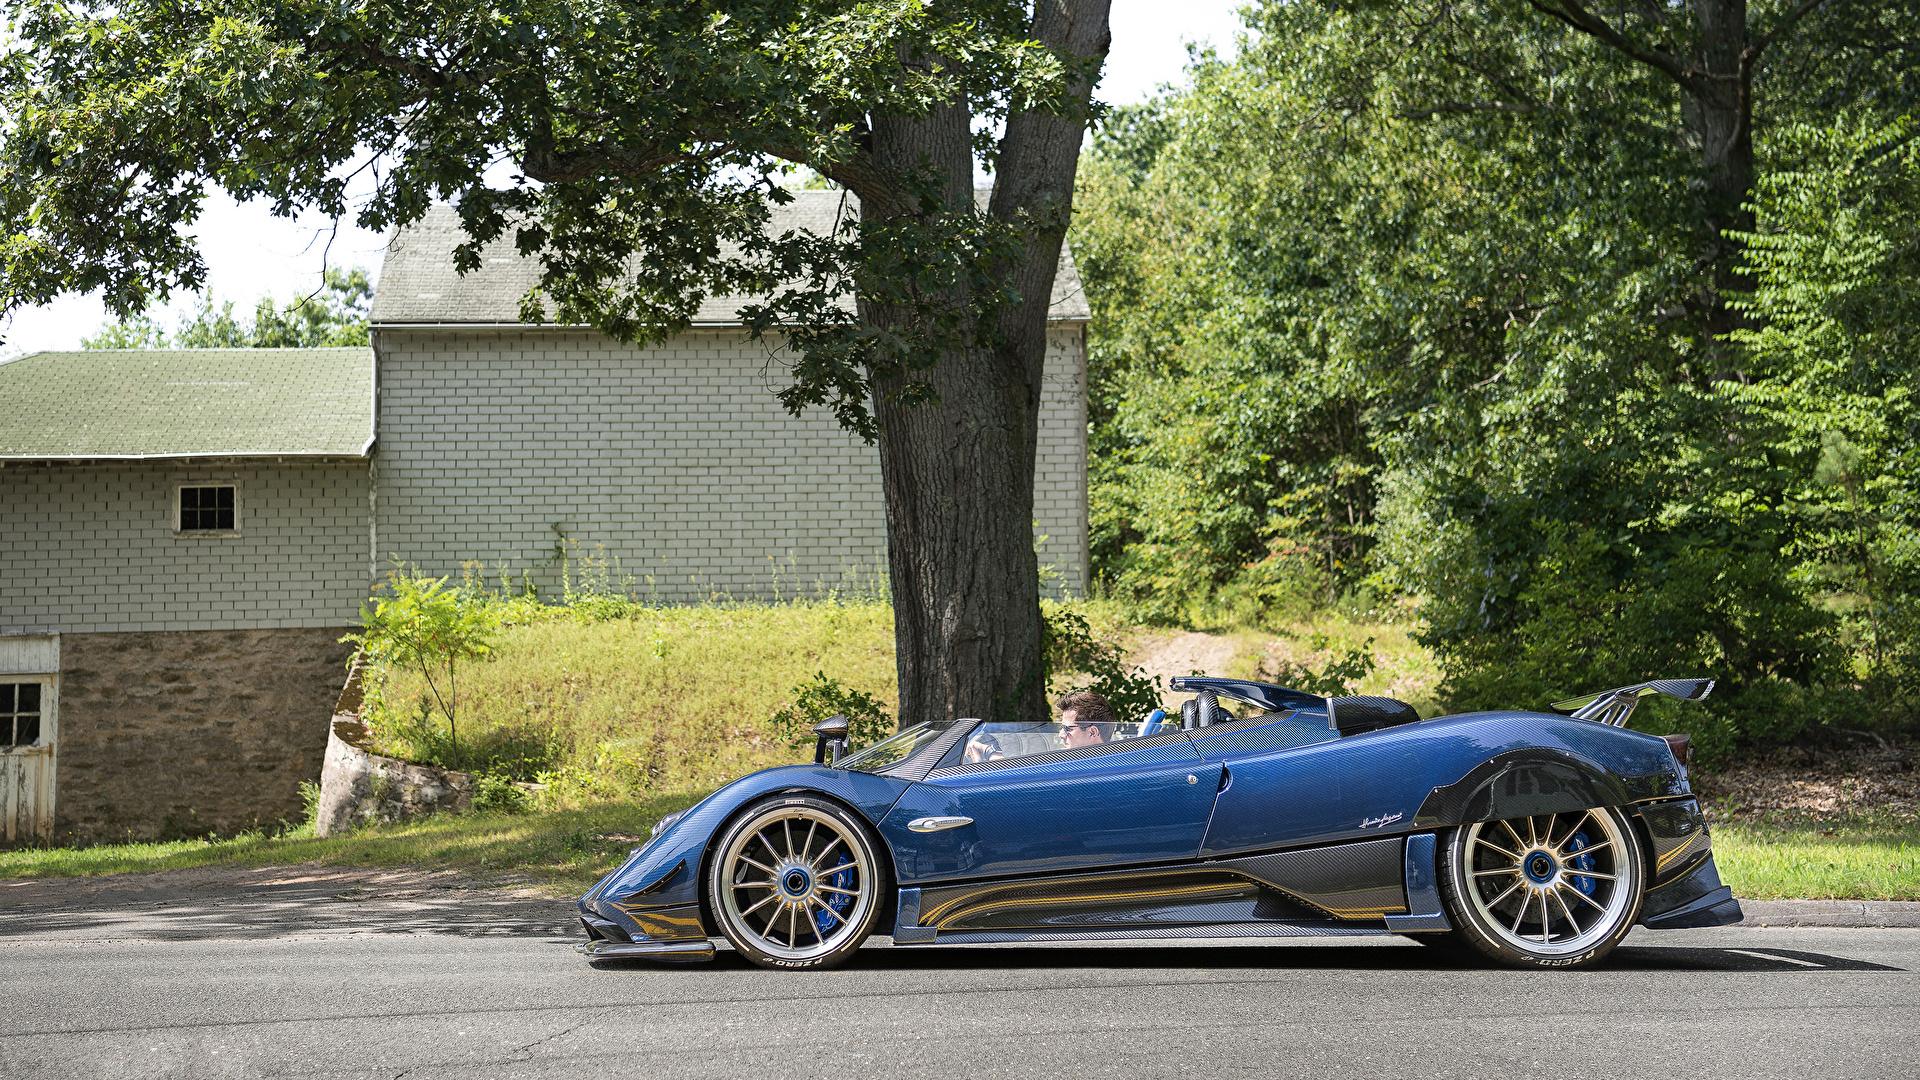 Papeis De Parede 1920x1080 Pagani 2017 18 Zonda Hp Barchetta Celeste Lateralmente Metalico Azul Roadster Carros Baixar Imagens